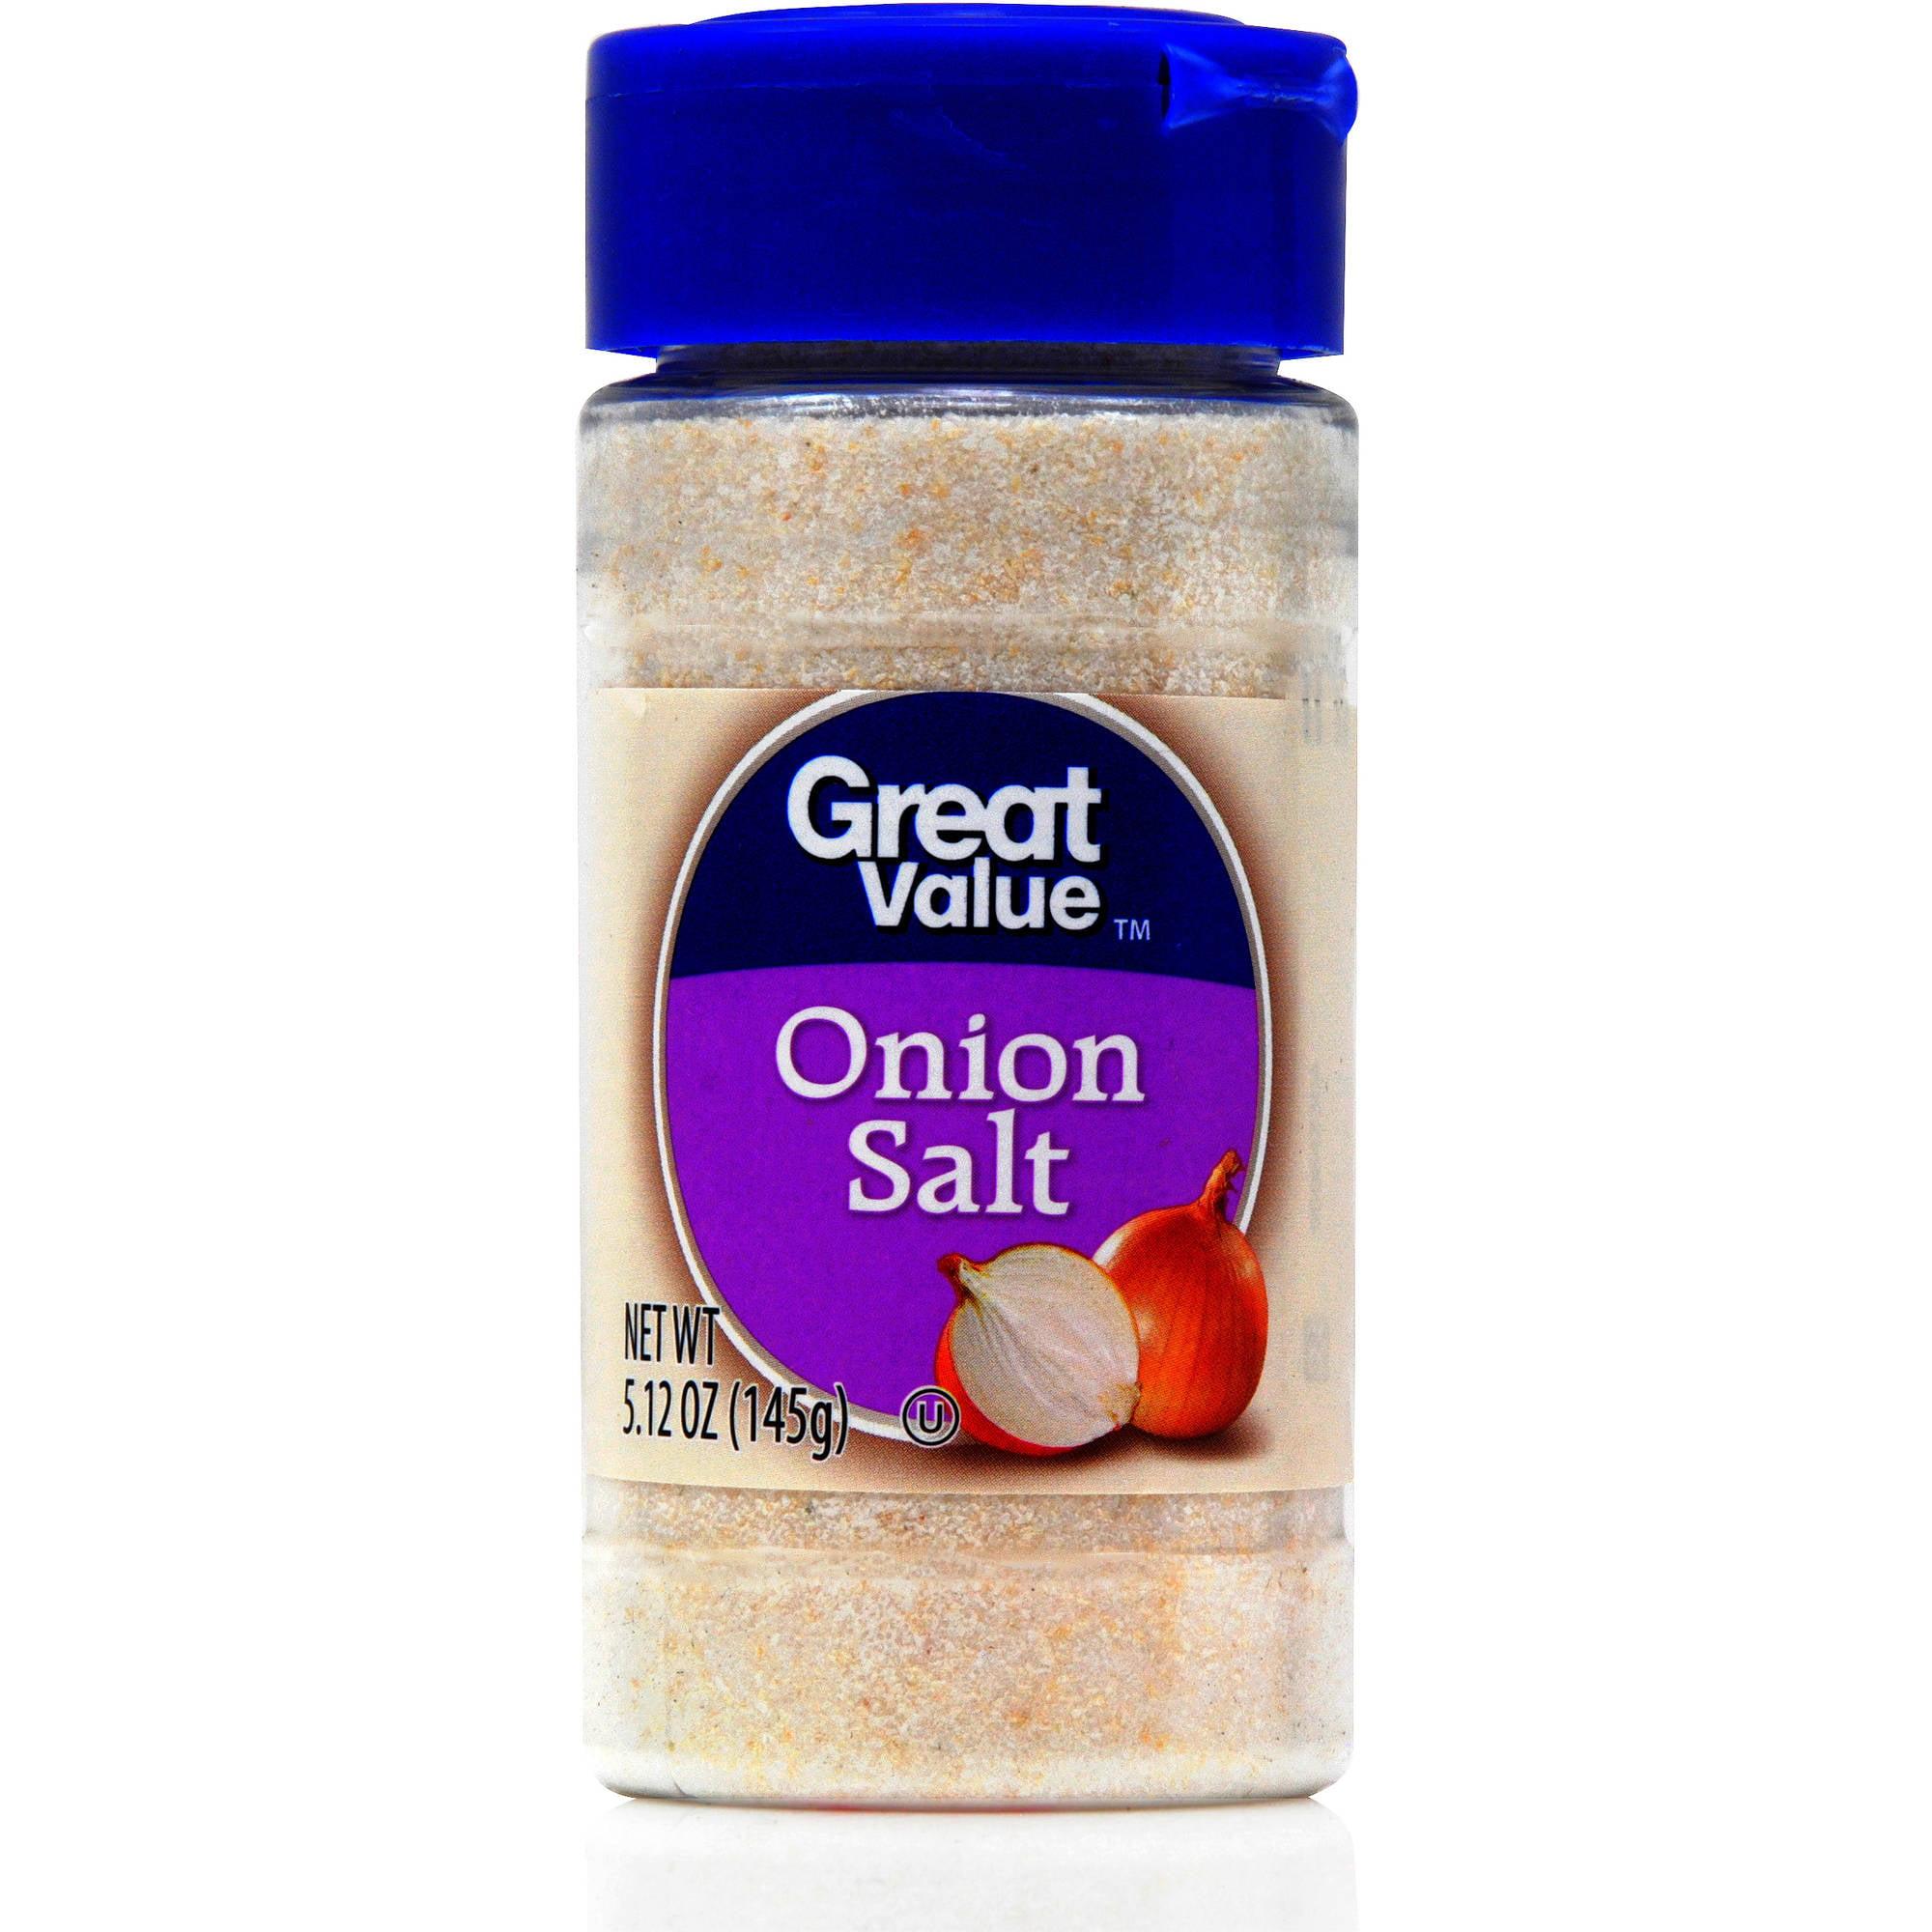 Great Value Onion Salt, 5.12 oz